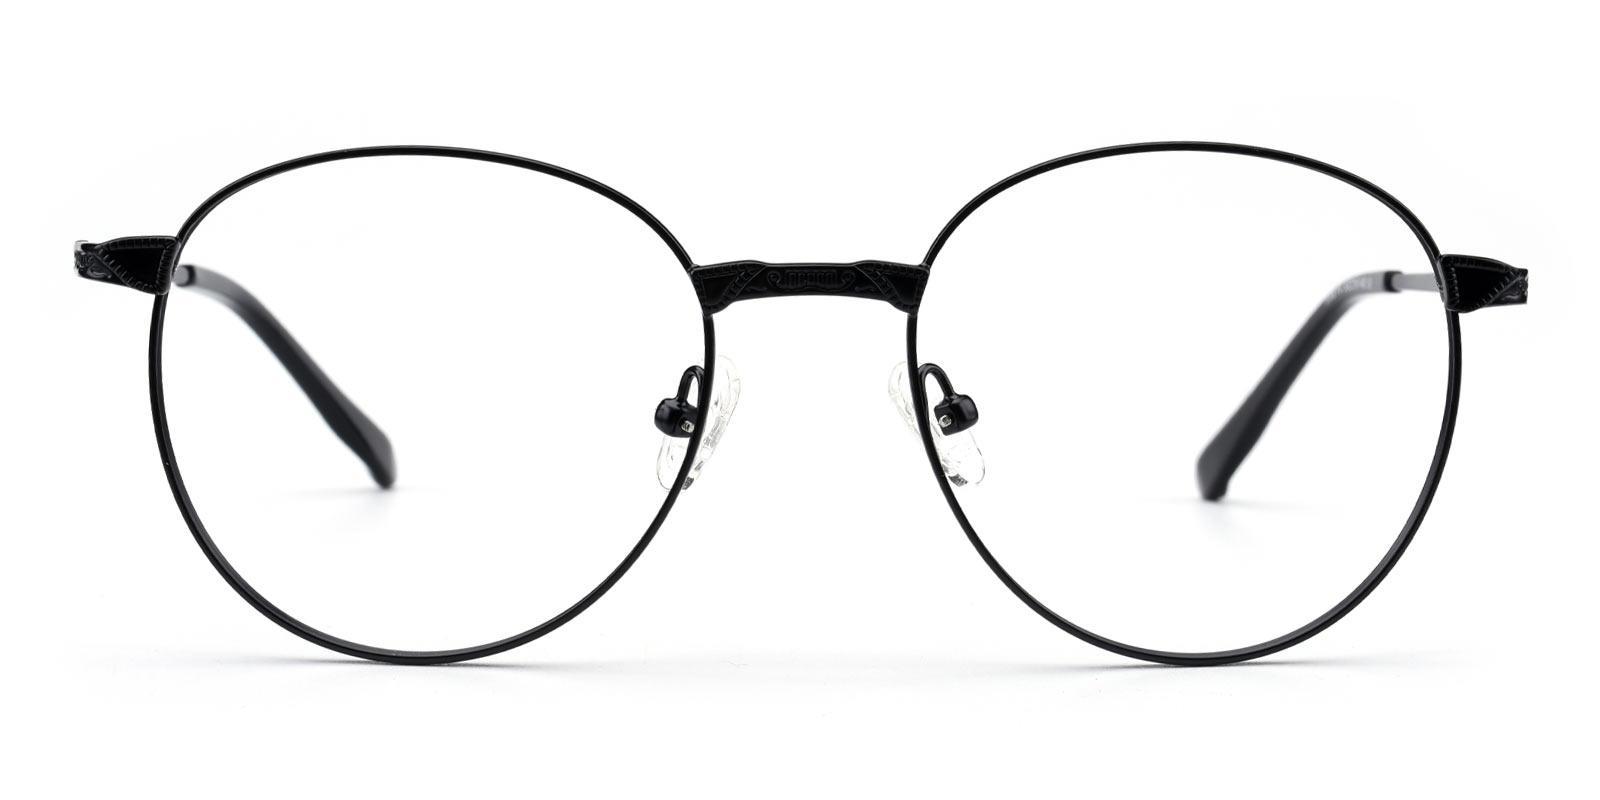 Camp-Black-Round-Metal-Eyeglasses-detail